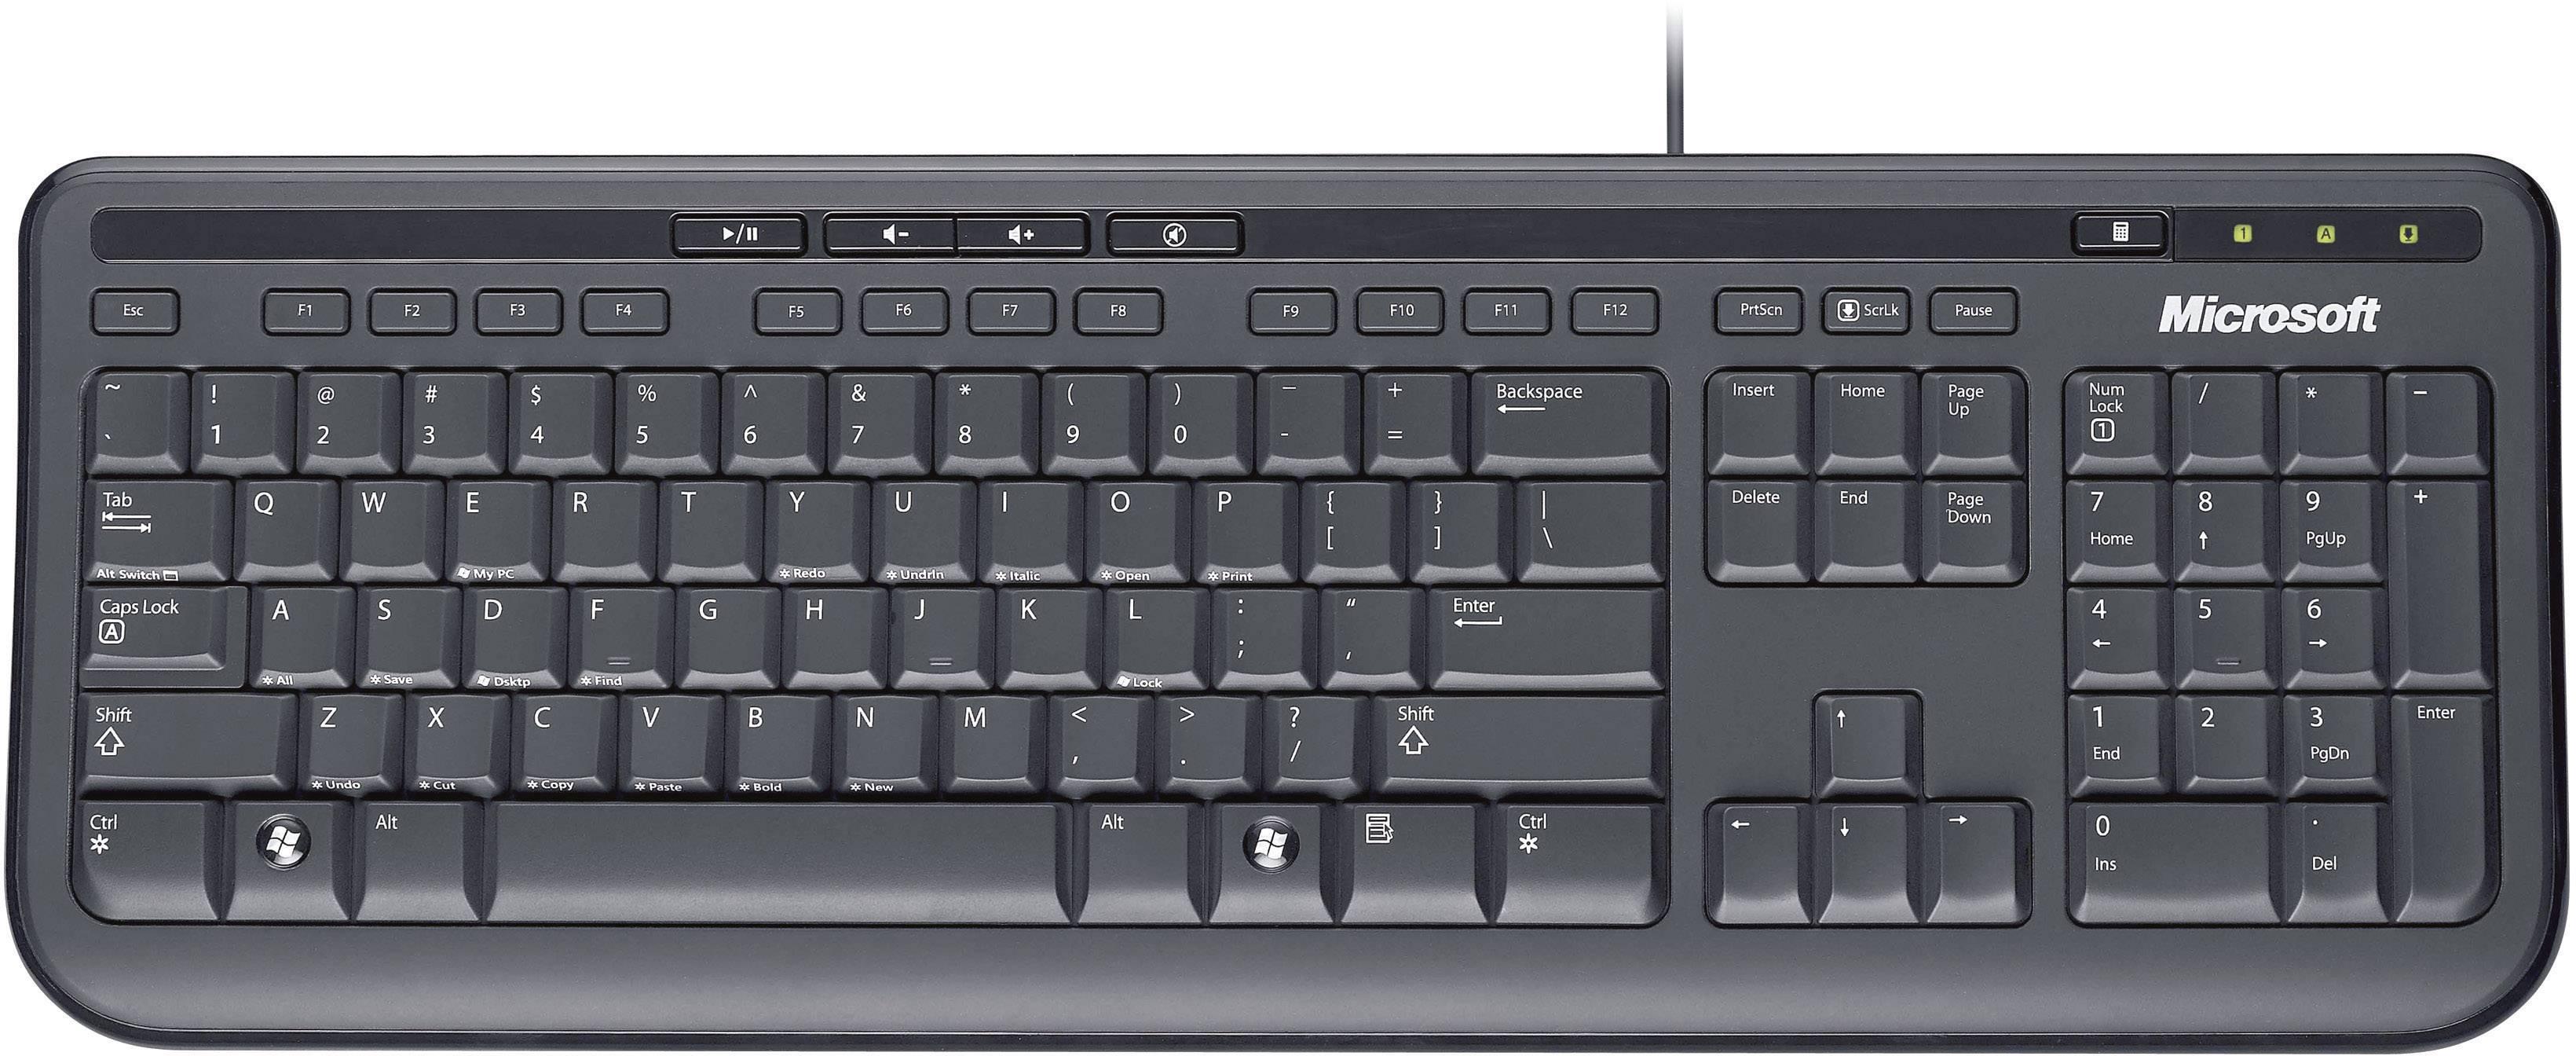 05e6e3d1bee Microsoft WIRED KEYBOARD 600 USB keyboard Black Splashproof | Conrad.com